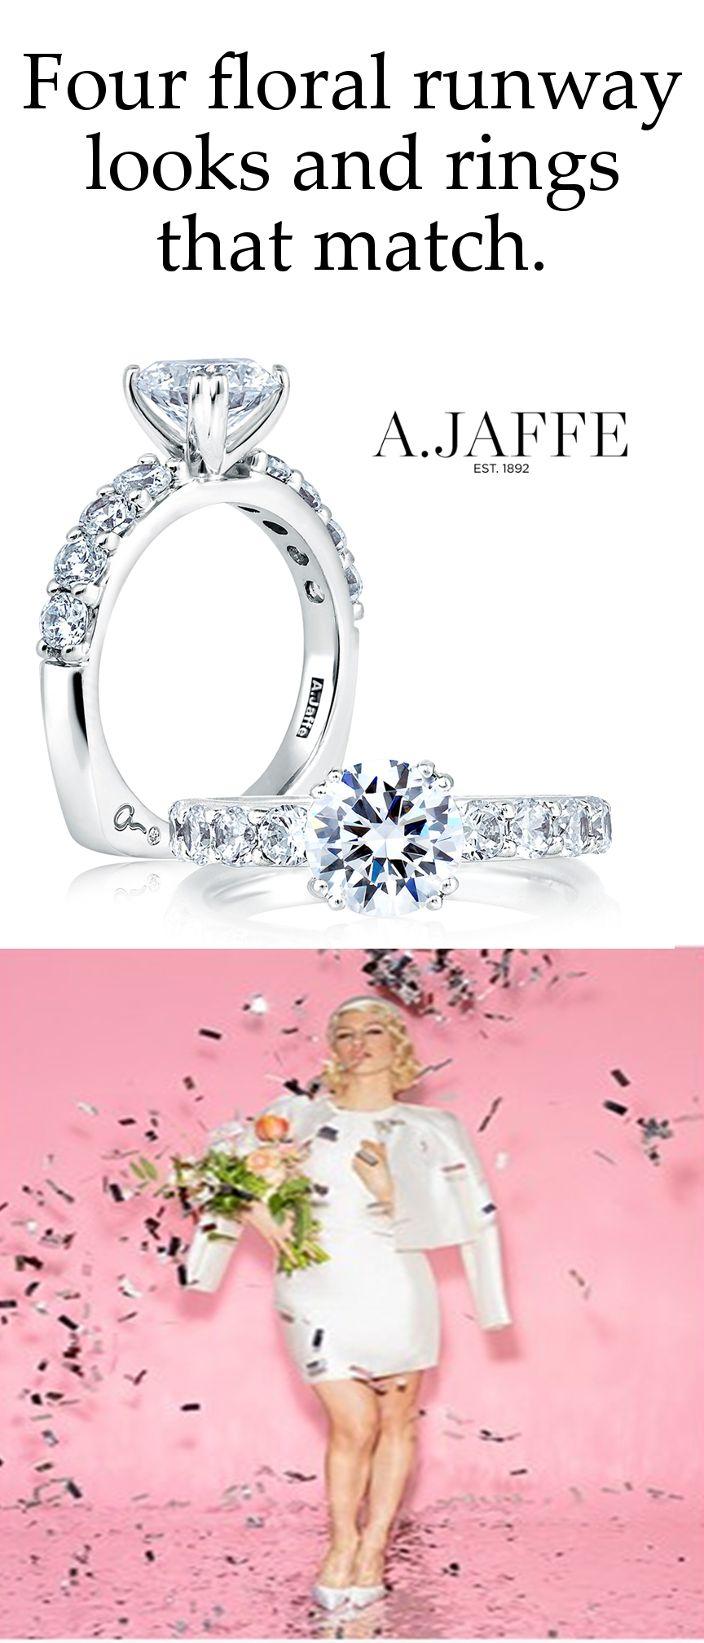 68 best A.jaffe Wedding Rings images on Pinterest | Wedding bands ...